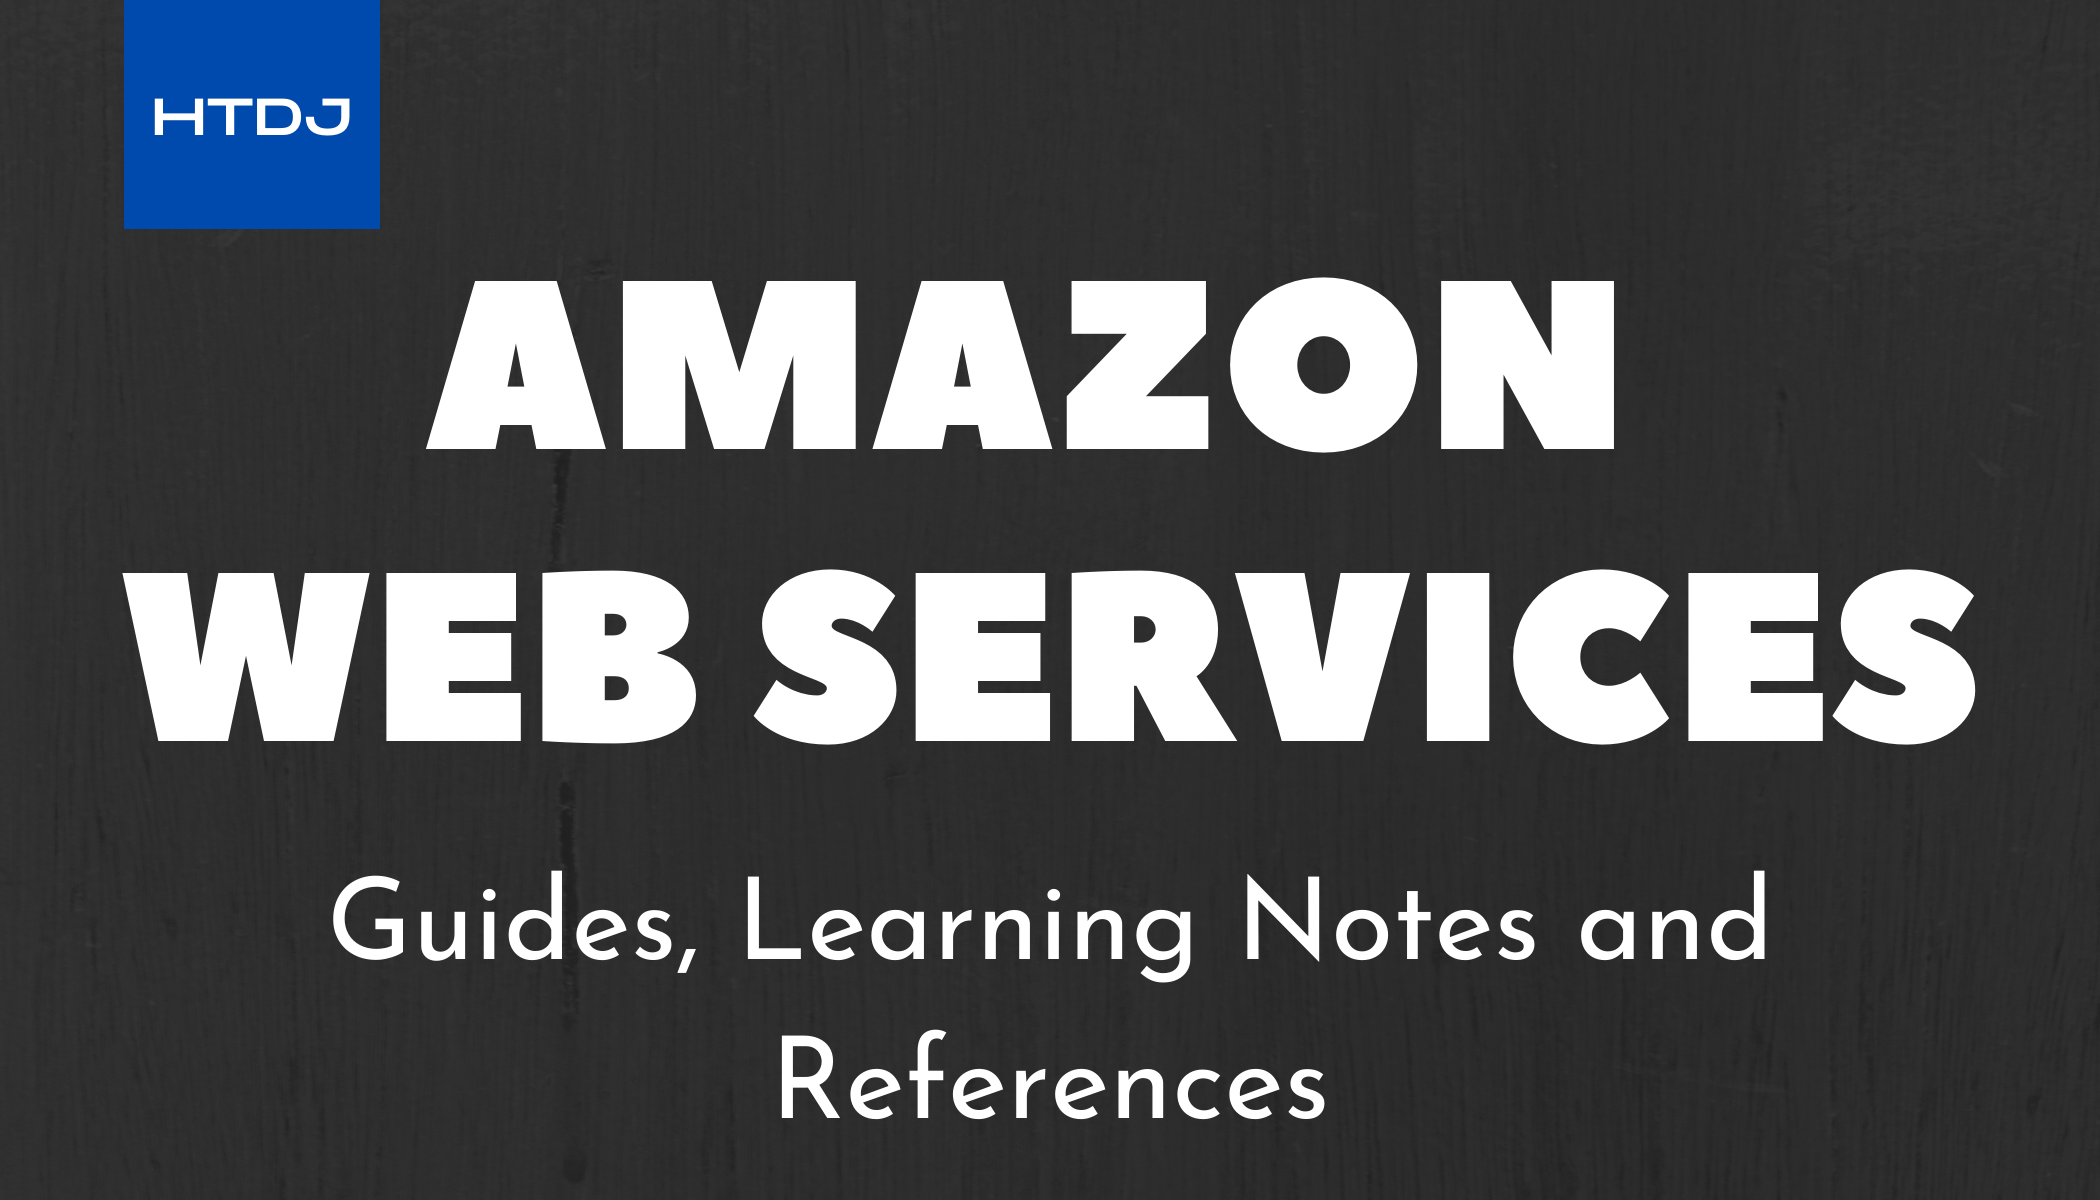 Amazon Web Services Guide